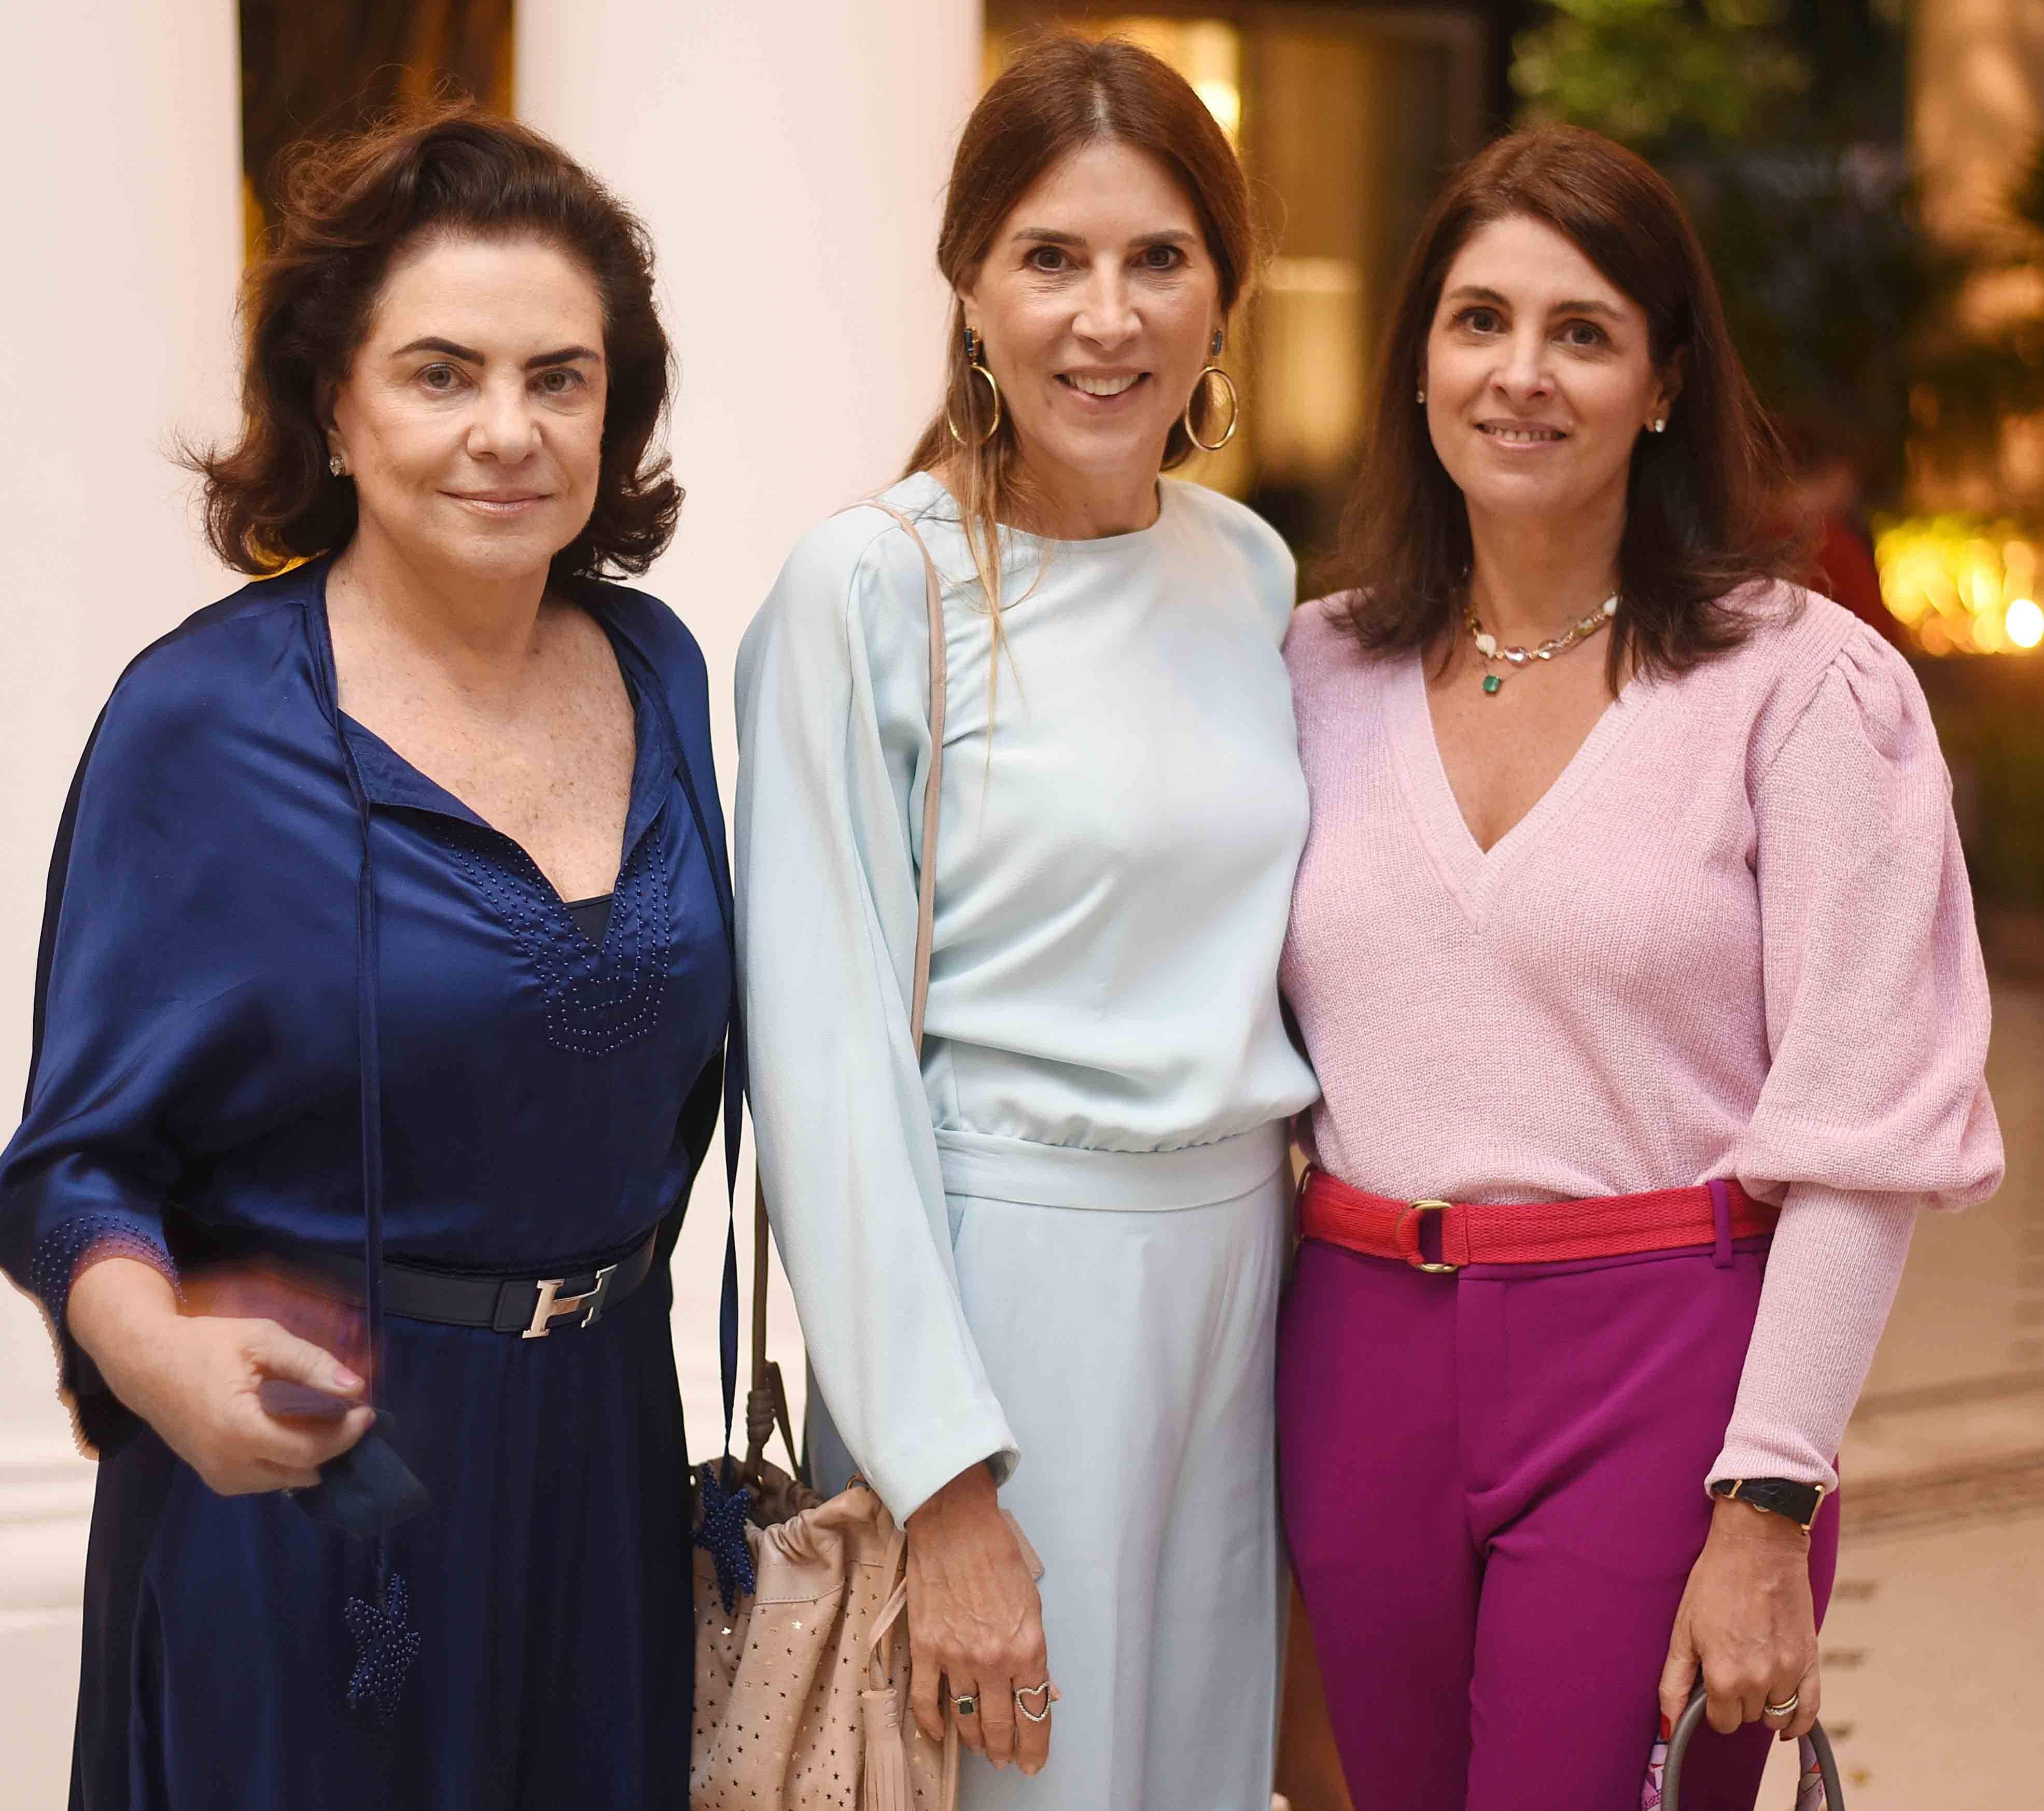 Cristina Burlamaqui, Claudia Souza Santos e Ana Gabriela Vianna  /Foto: Ari Kaye